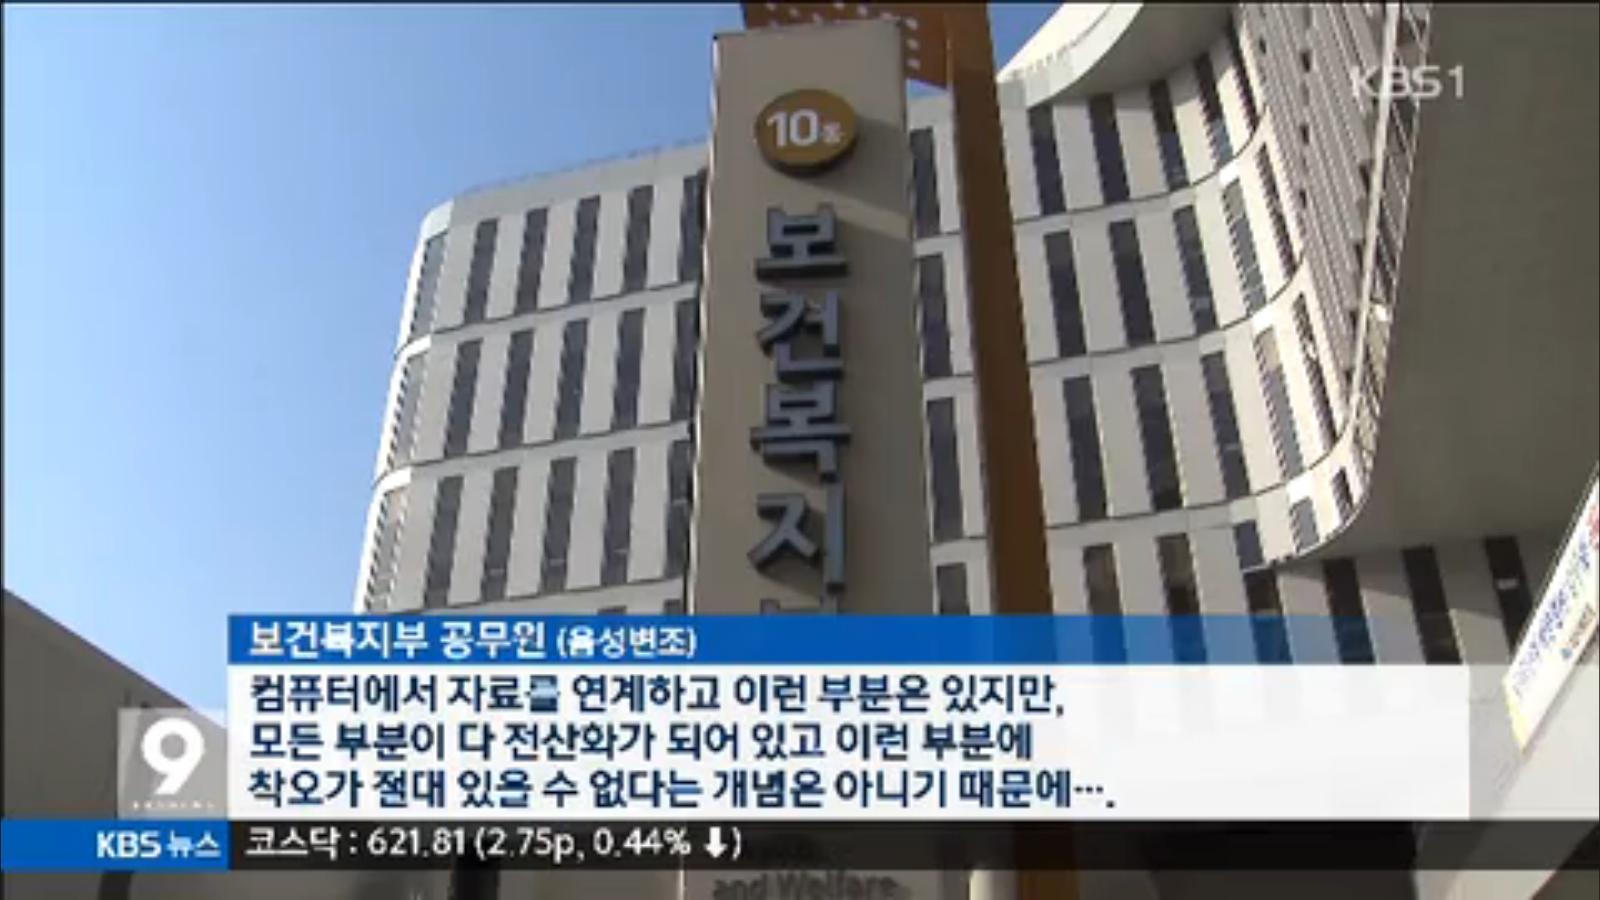 [15.3.2 KBS전주] 전주시, 빈곤층 울리는 허술한 복지행정4.jpg